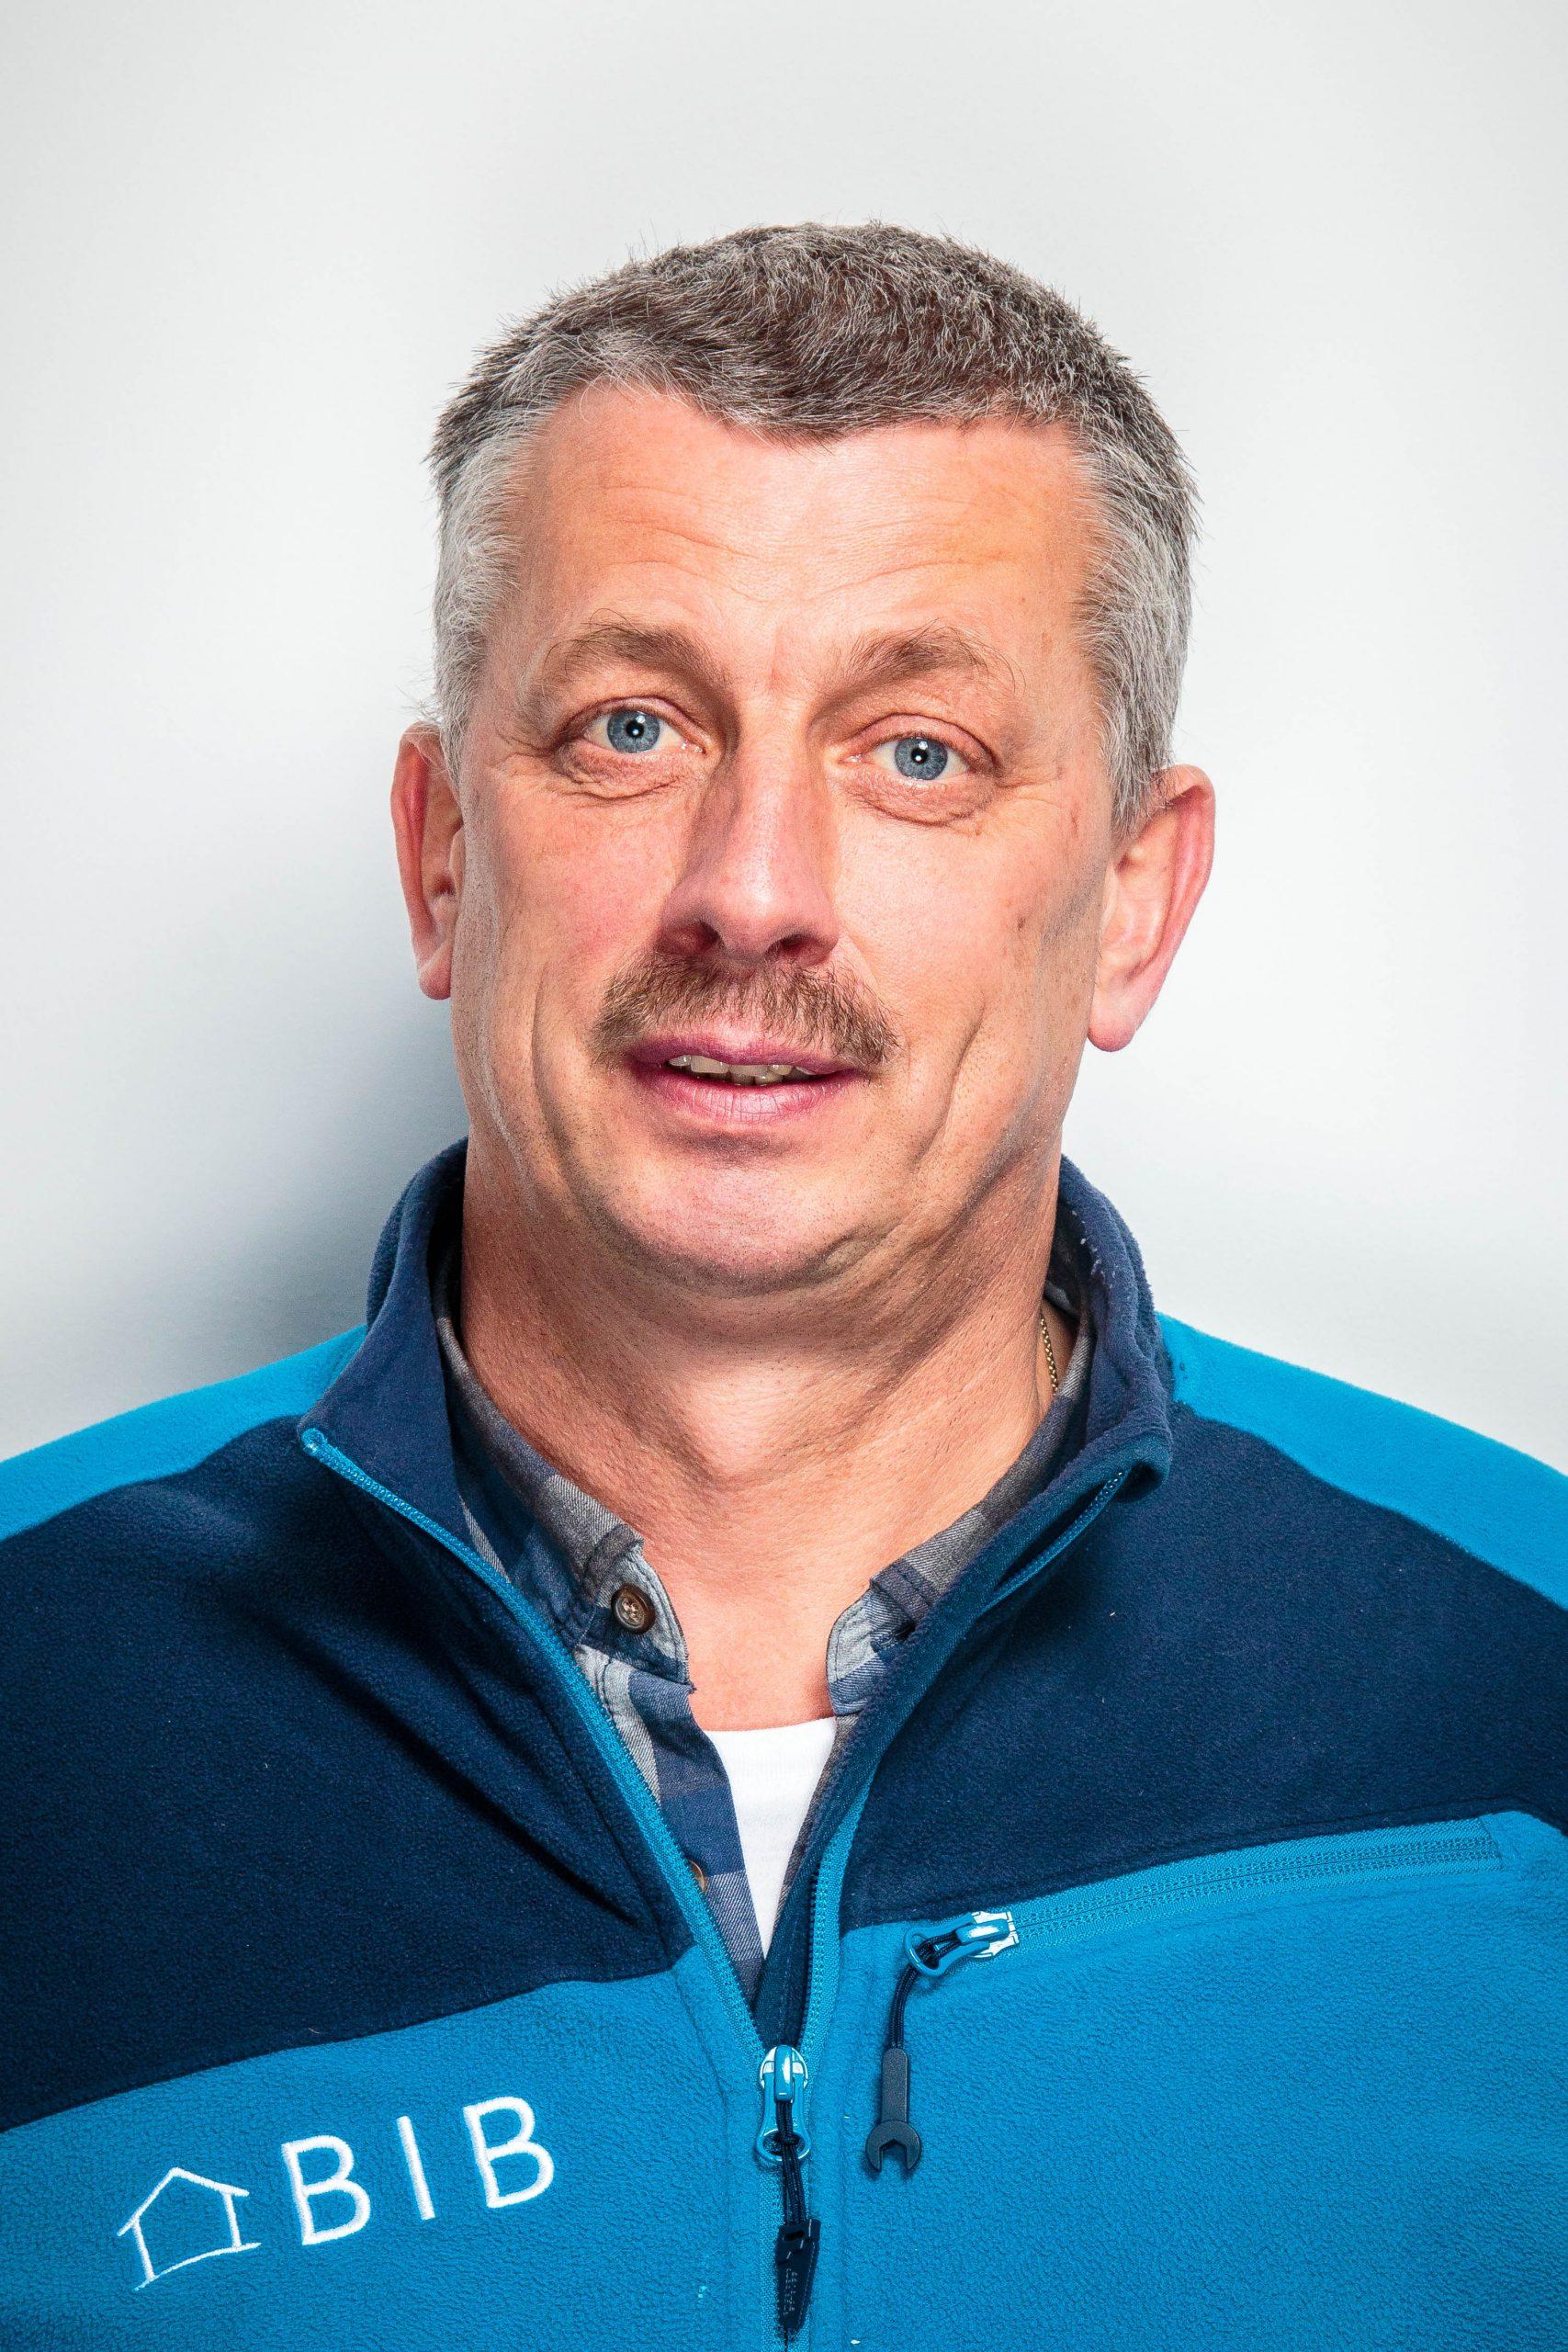 Martin Potthoff